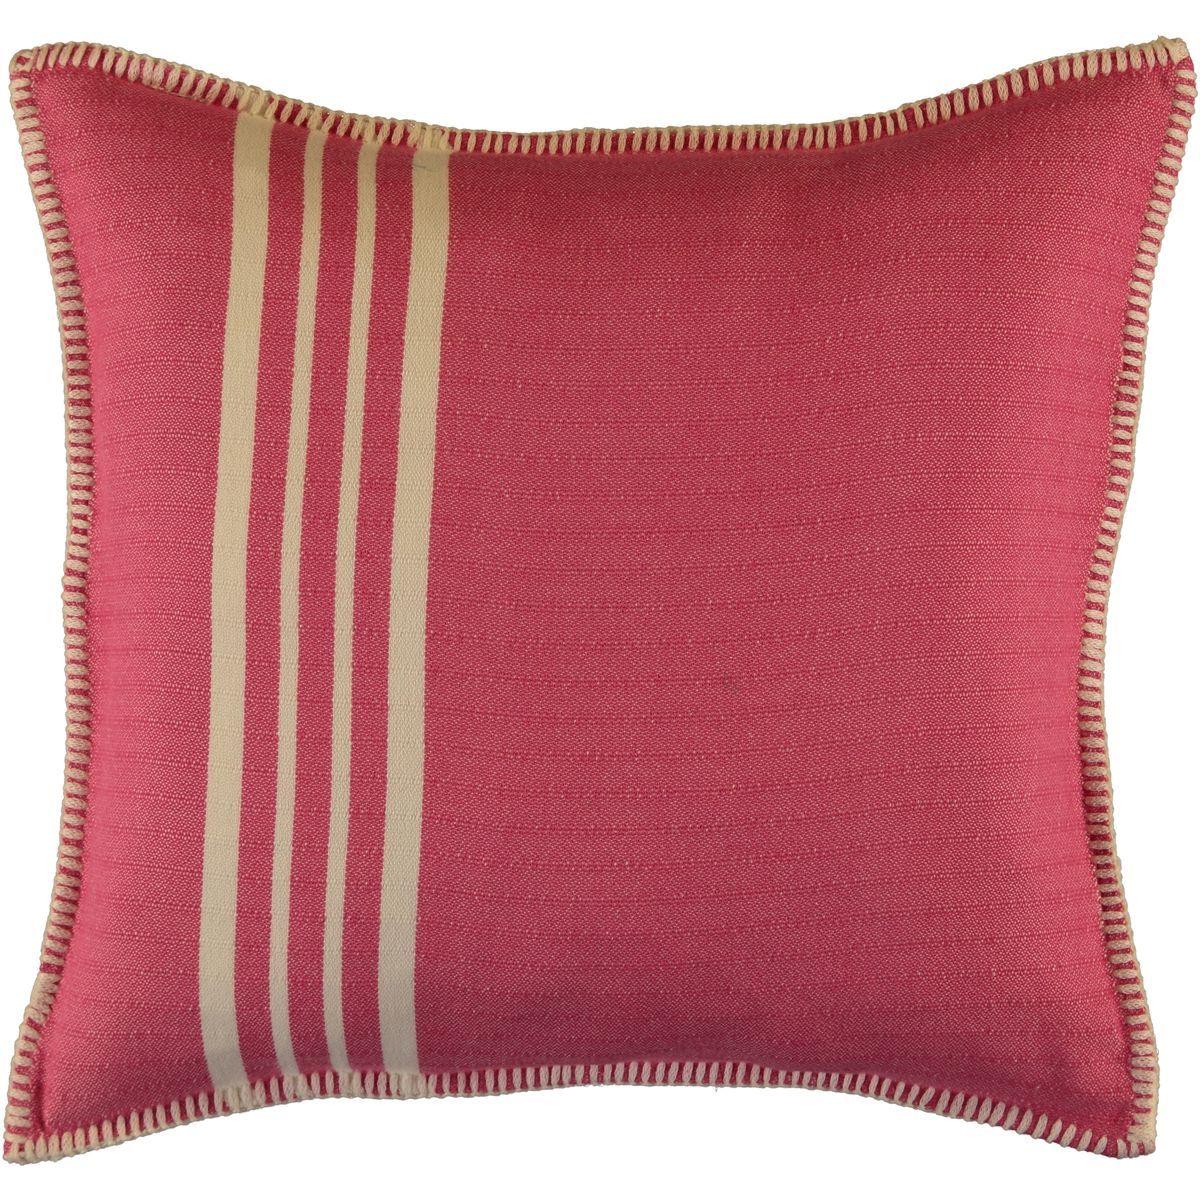 Cushion Cover Sultan - Fucshia / 45x45